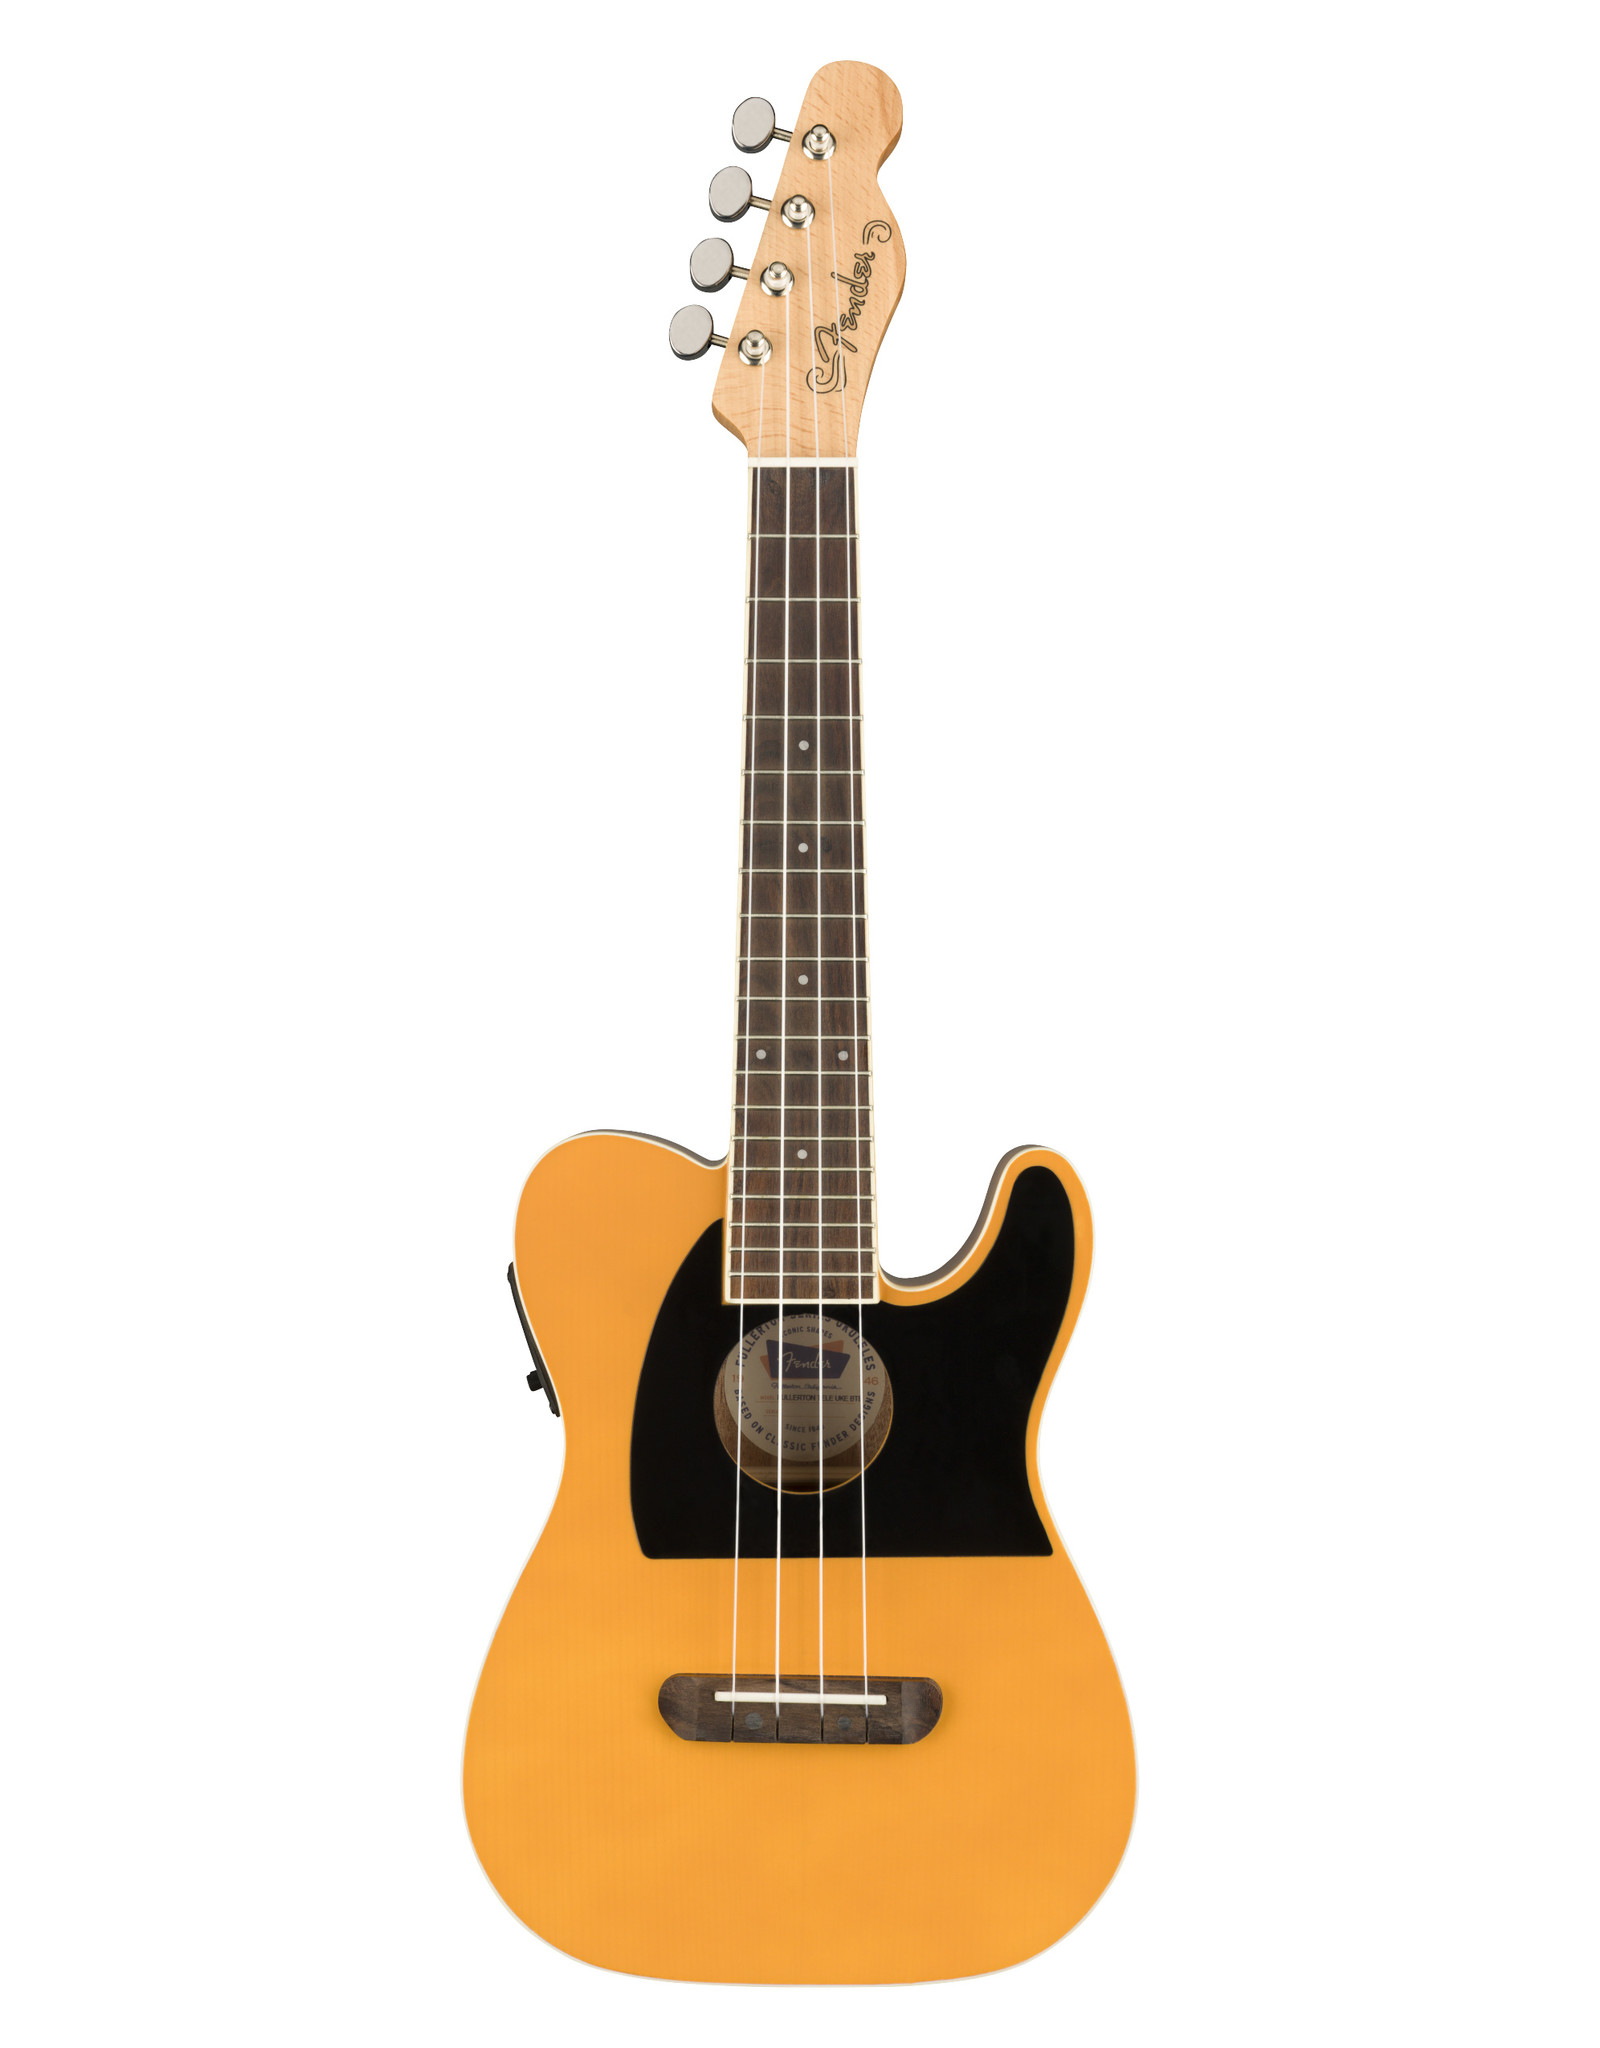 Fender Fender Fullerton Tele® Uke, Butterscotch Blonde